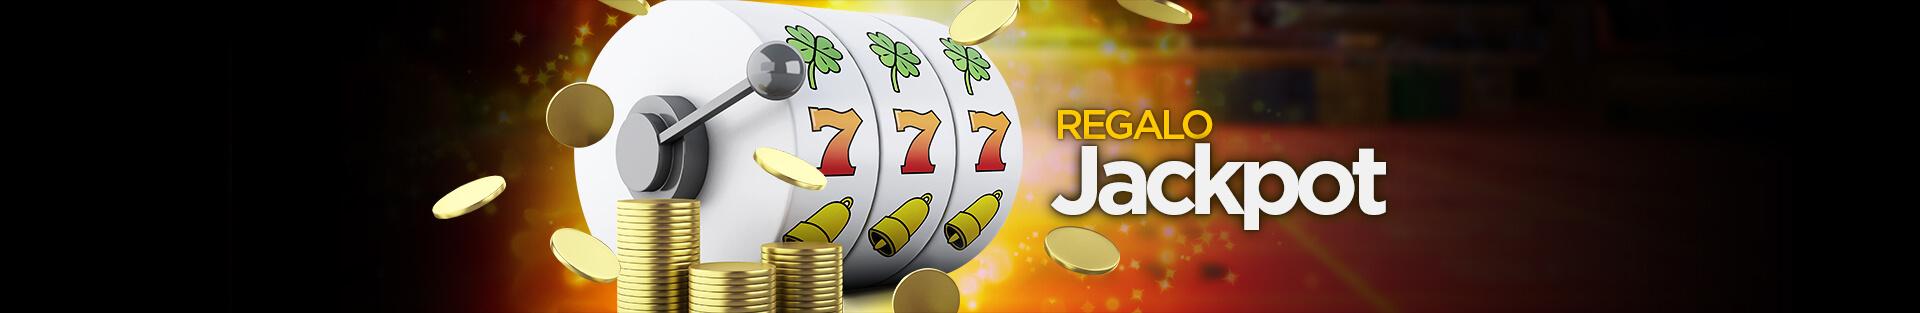 Banner - Jackpots